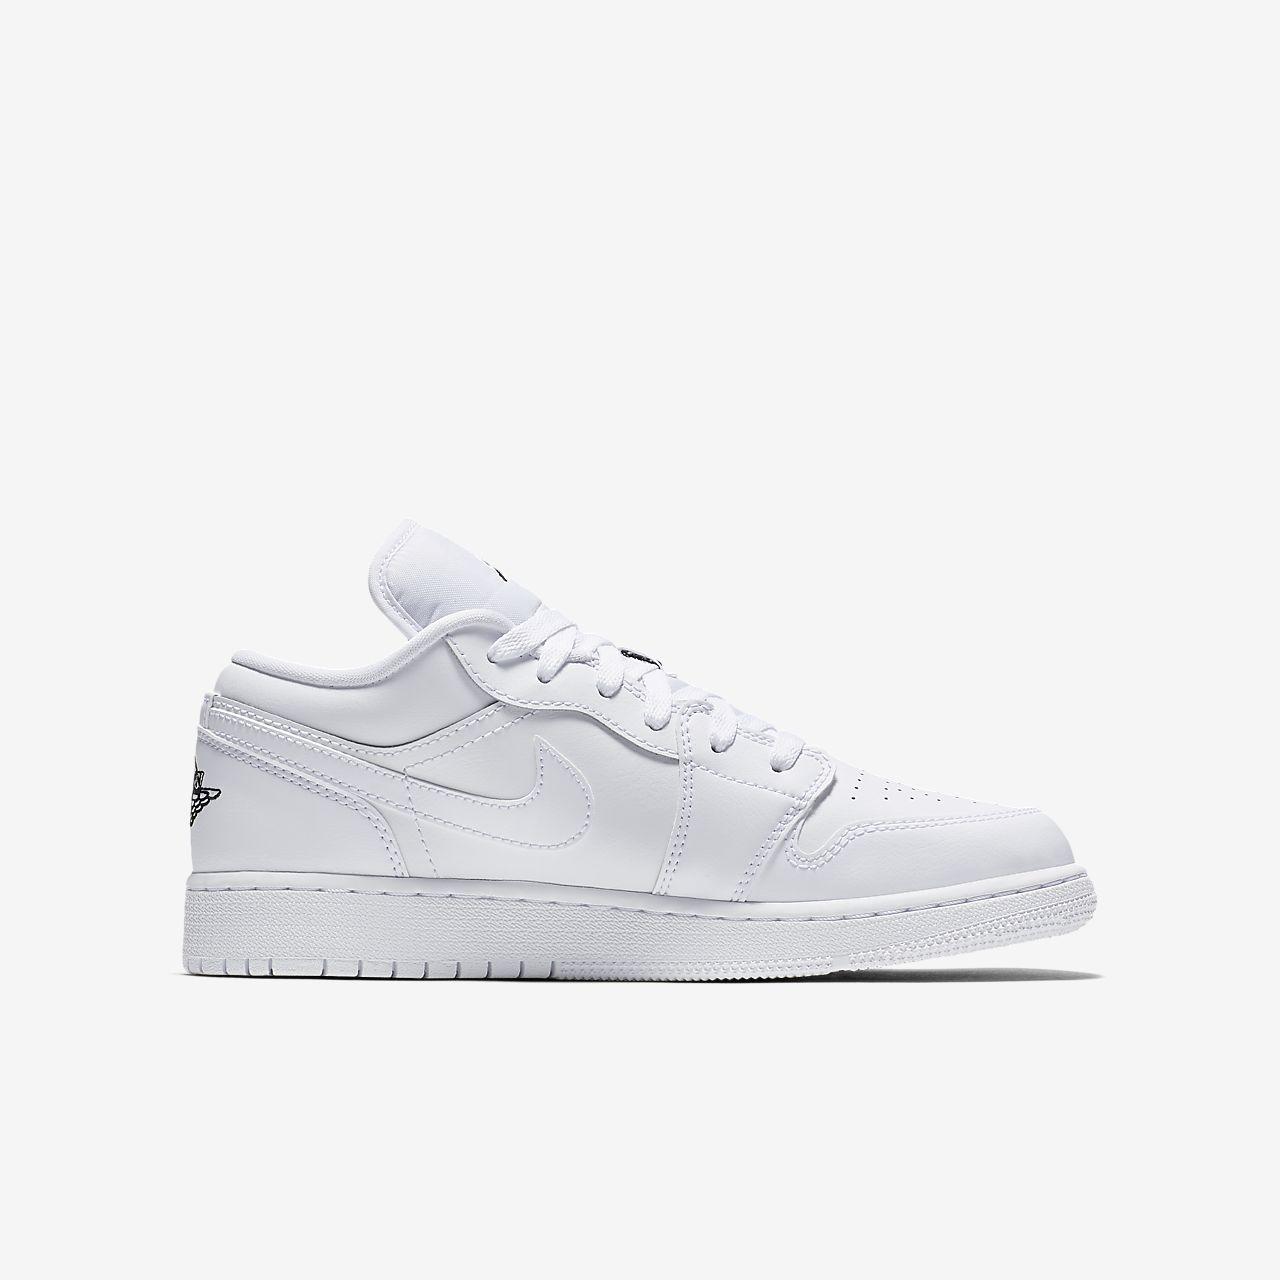 5ce915b142f9e2 Air Jordan 1 Low Older Kids  Shoe. Nike.com AU